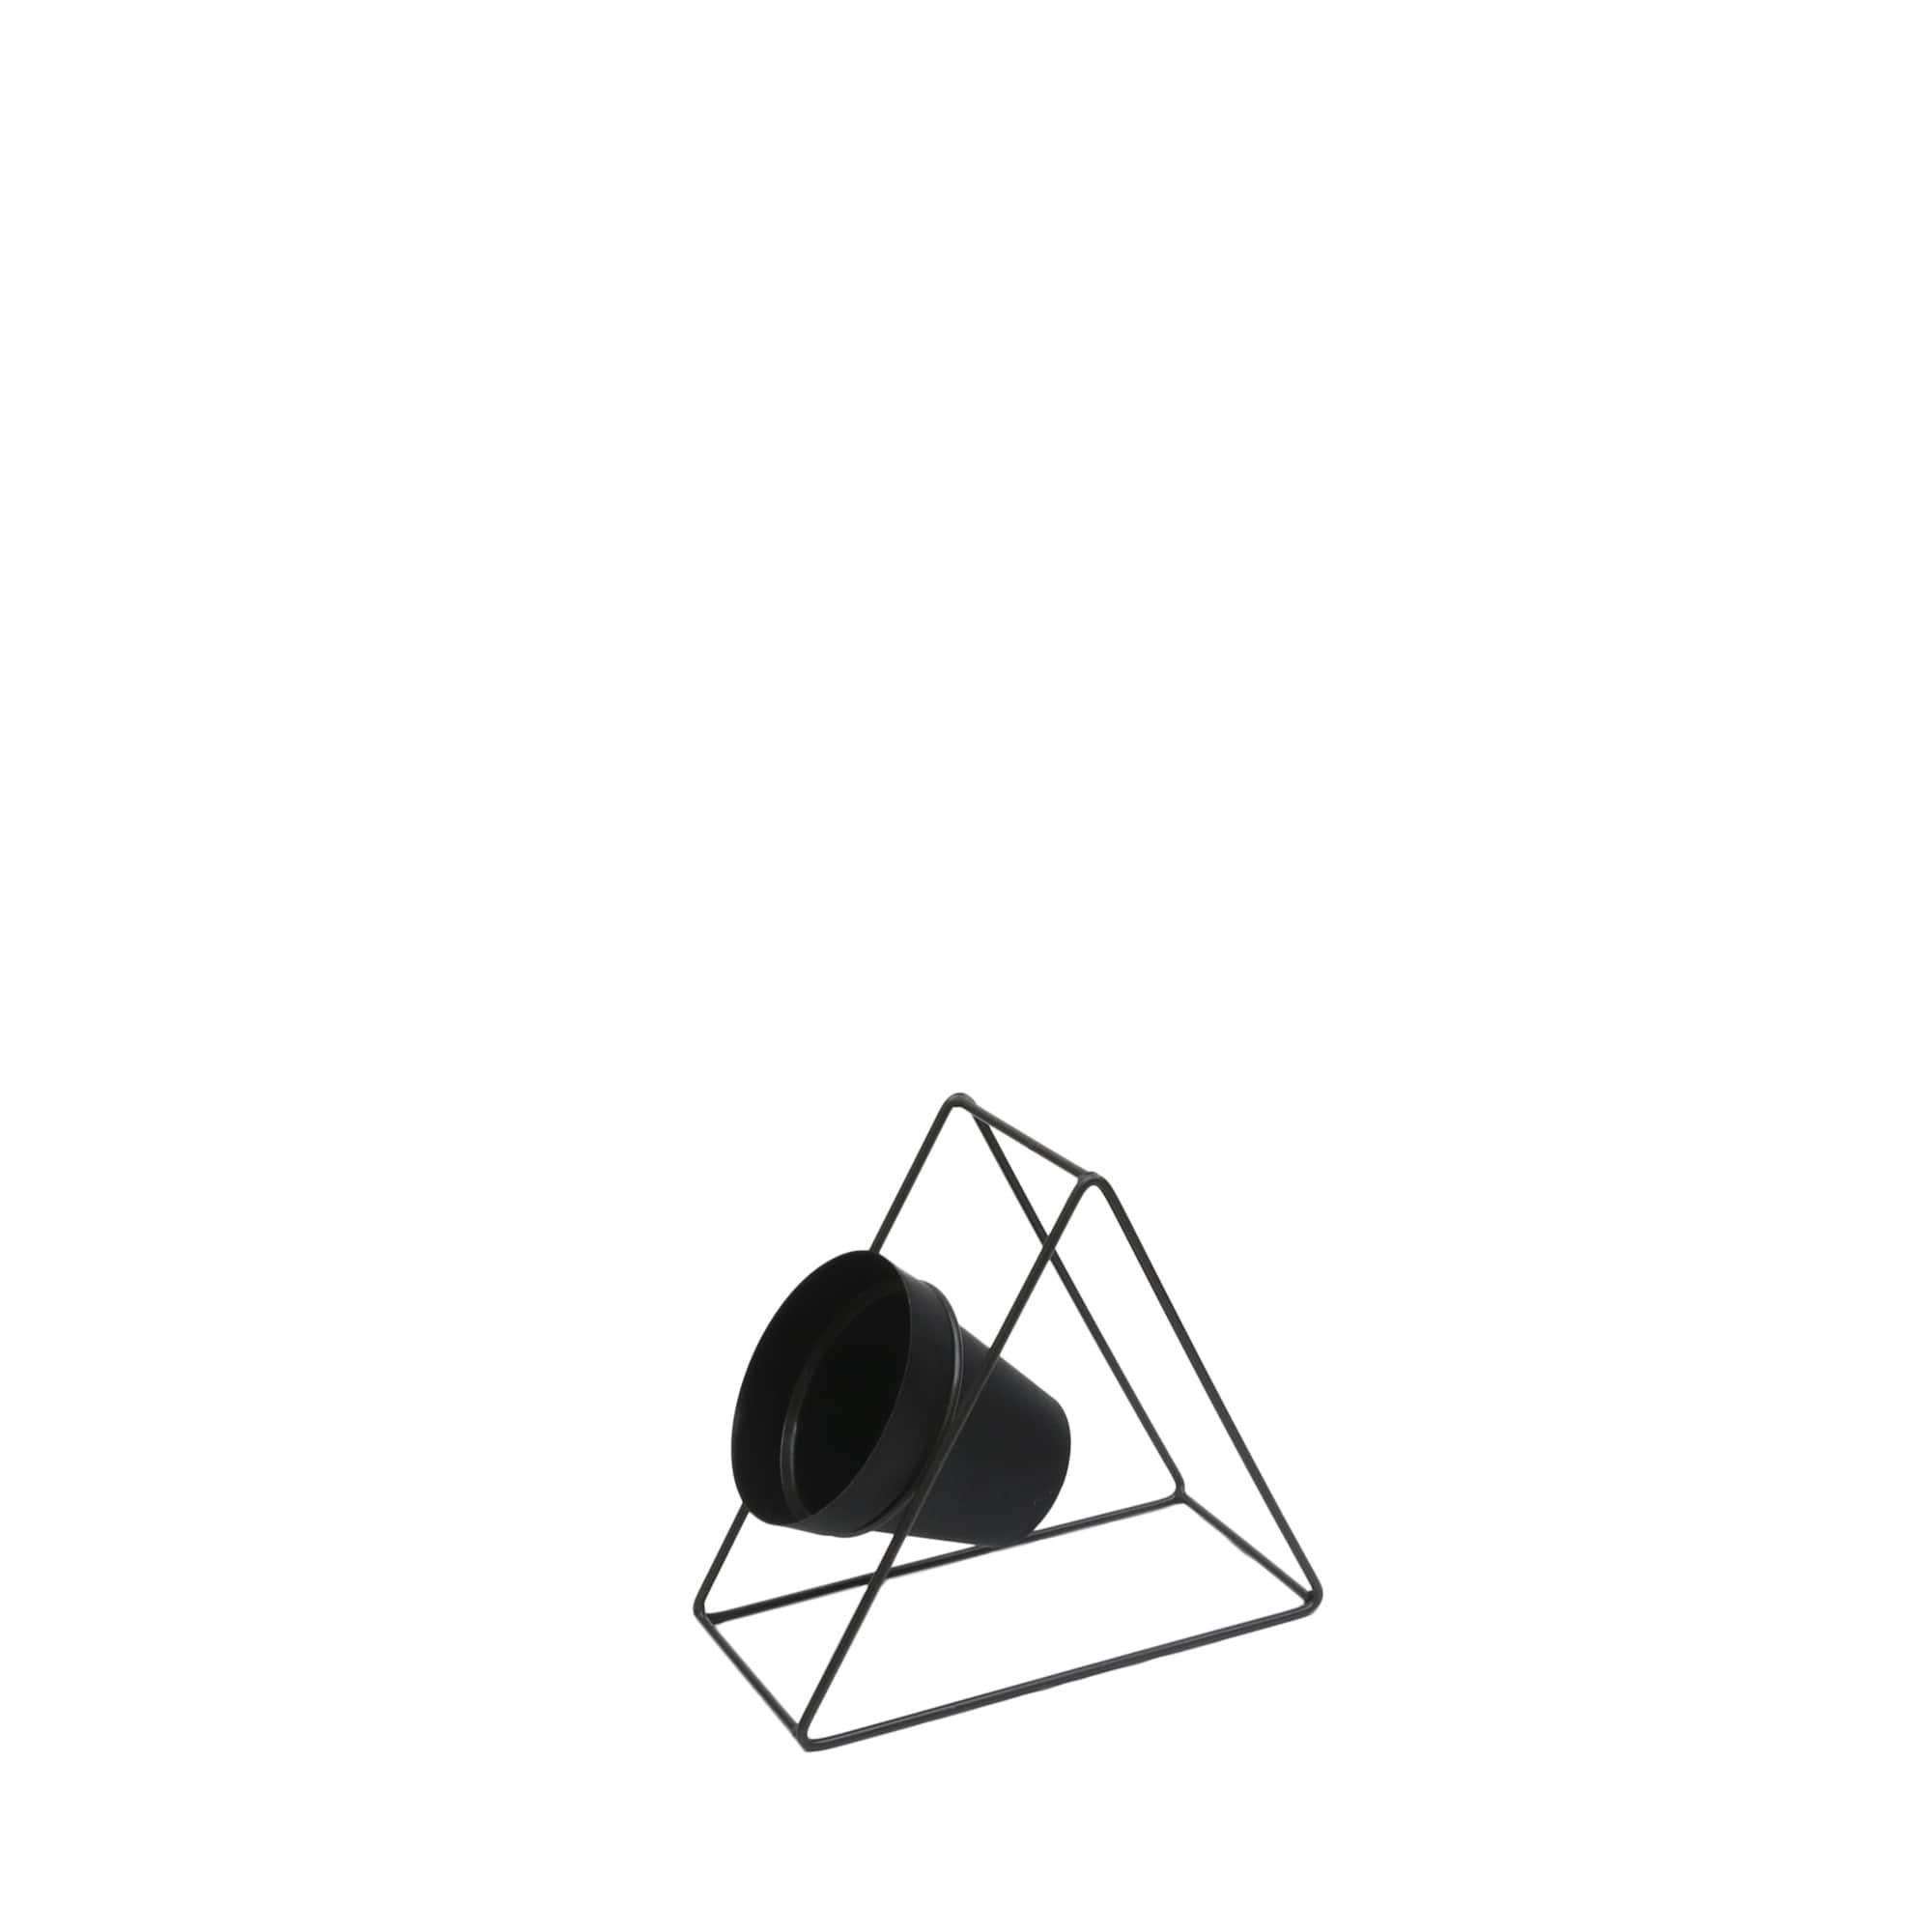 Suporte Ferro Triângulo Parede 24 x 24 cm Vasart